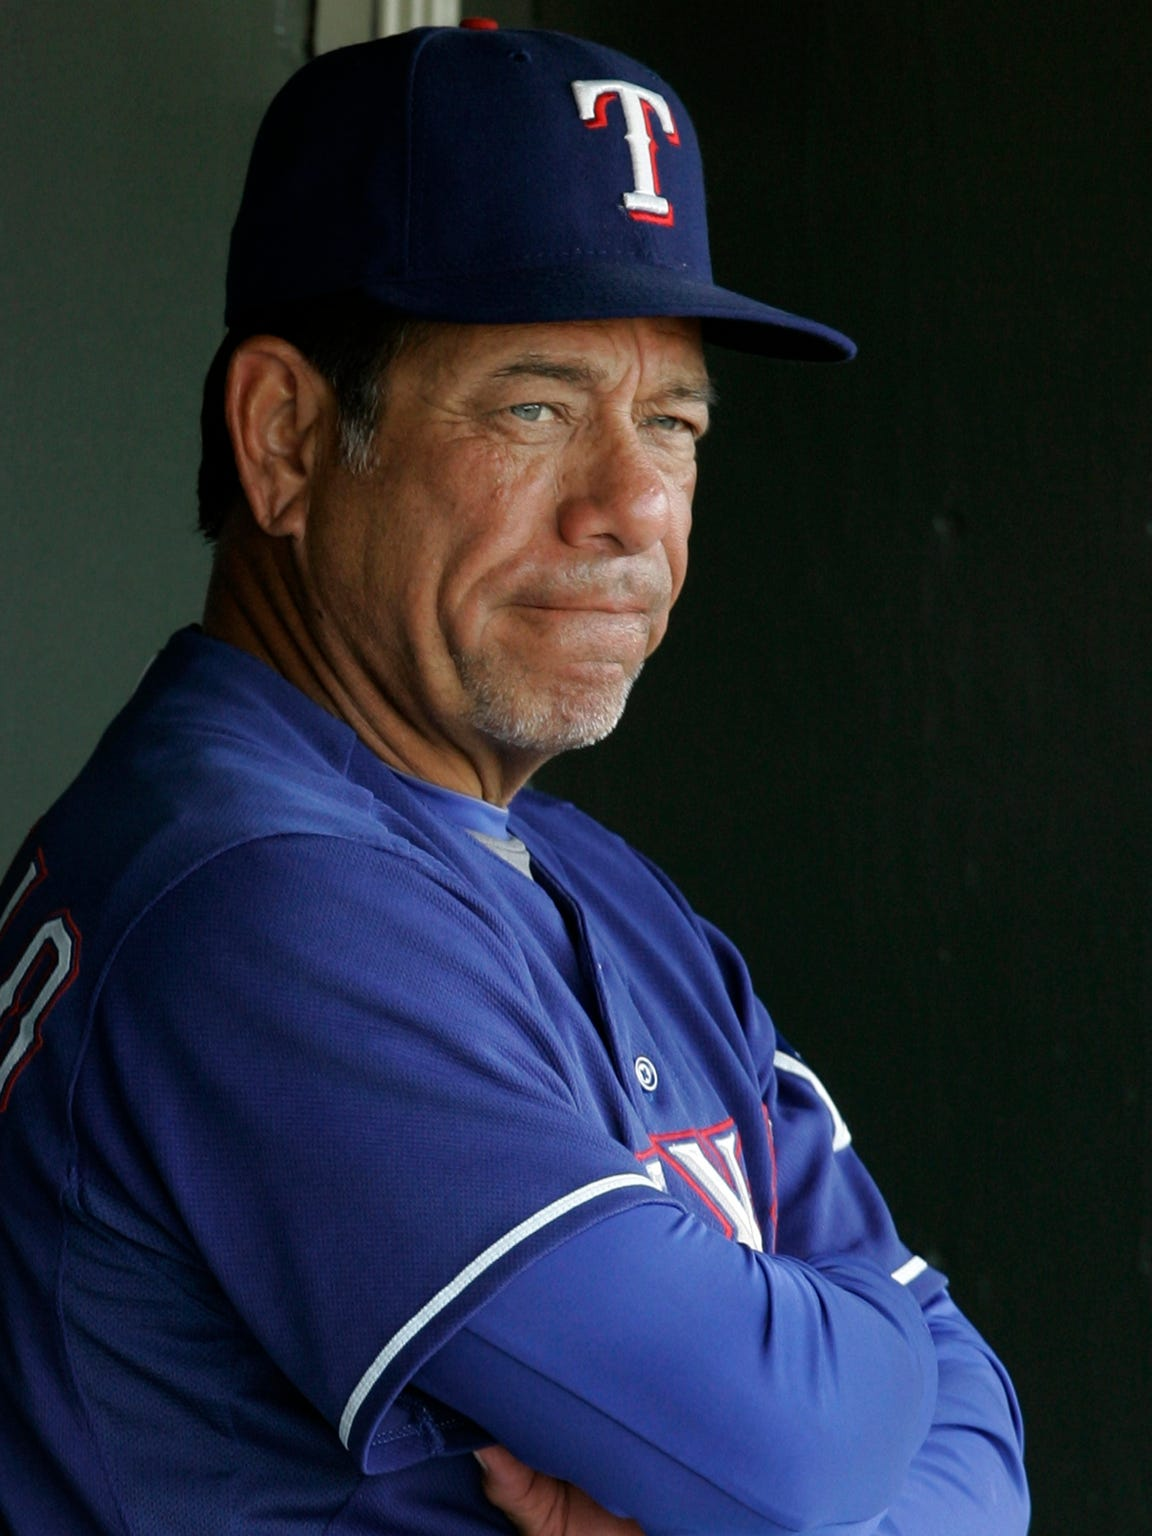 Texas Rangers batting coach Rudy Jaramillo before the